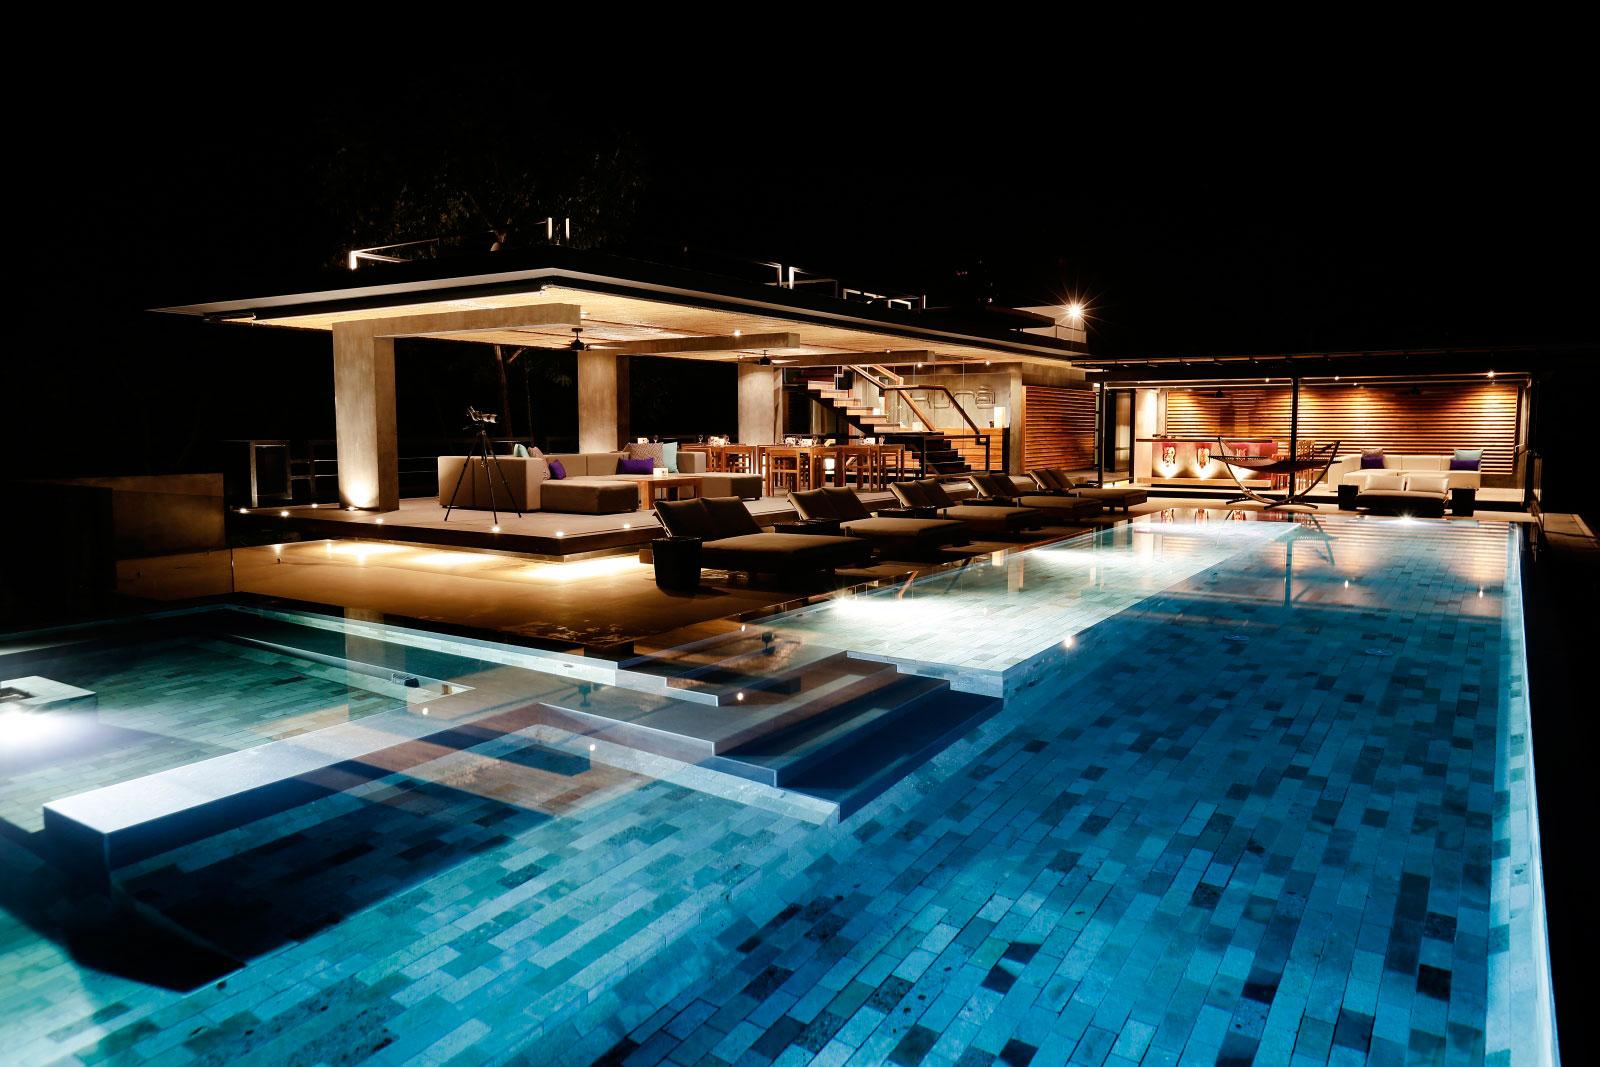 Pool, Lighting, Terrace, Holiday Villas in Costa Rica